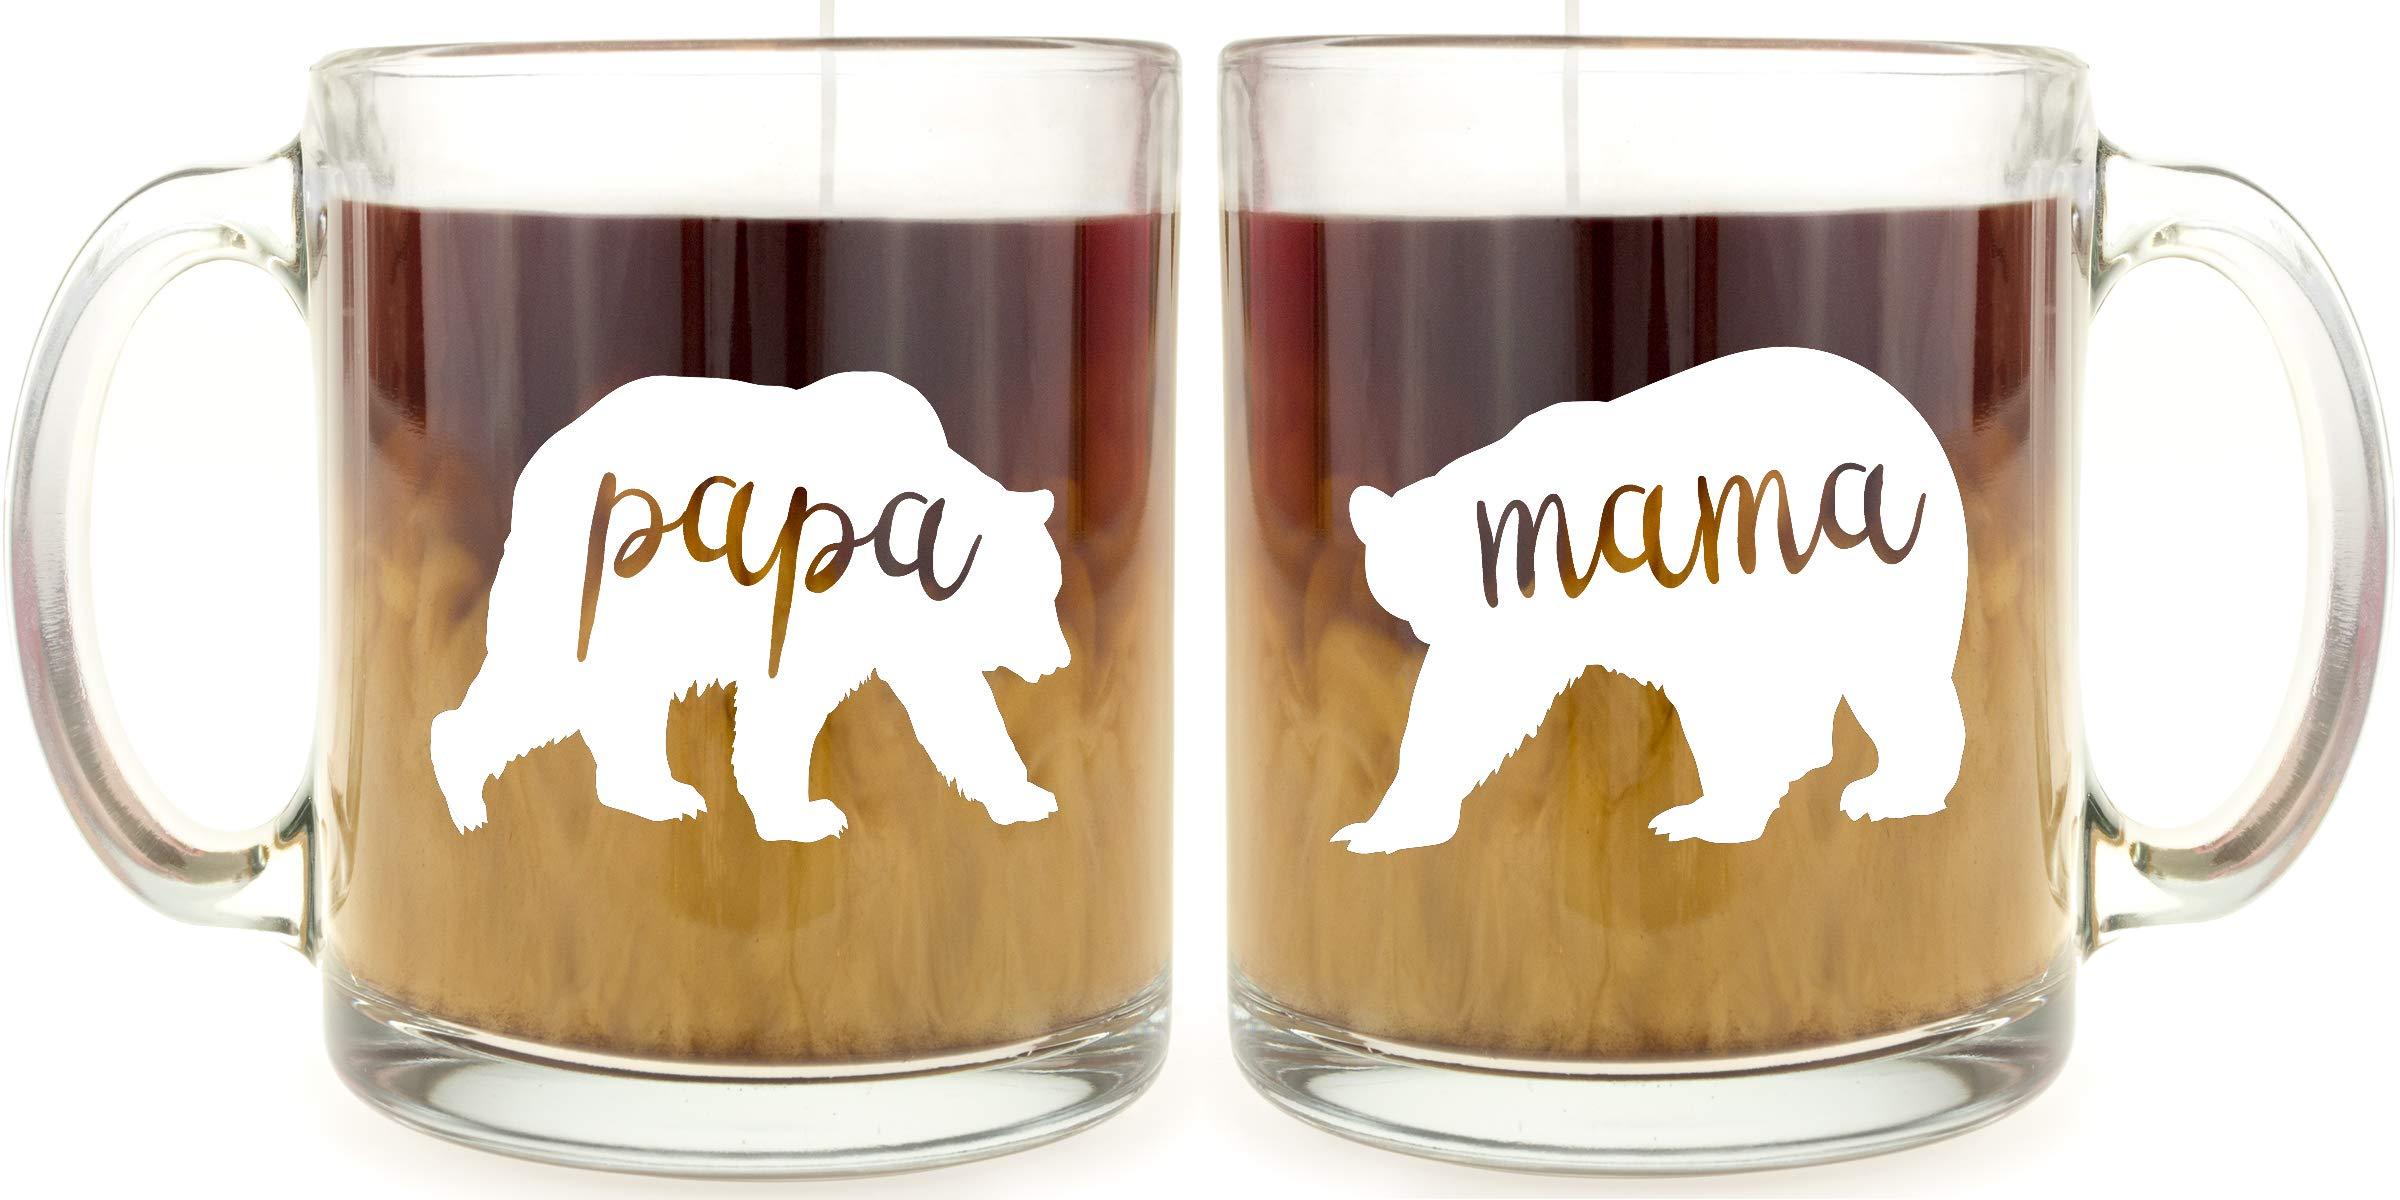 Mama Bear & Papa Bear Glass Coffee Mug Set ... by Make Em Laugh (Image #1)